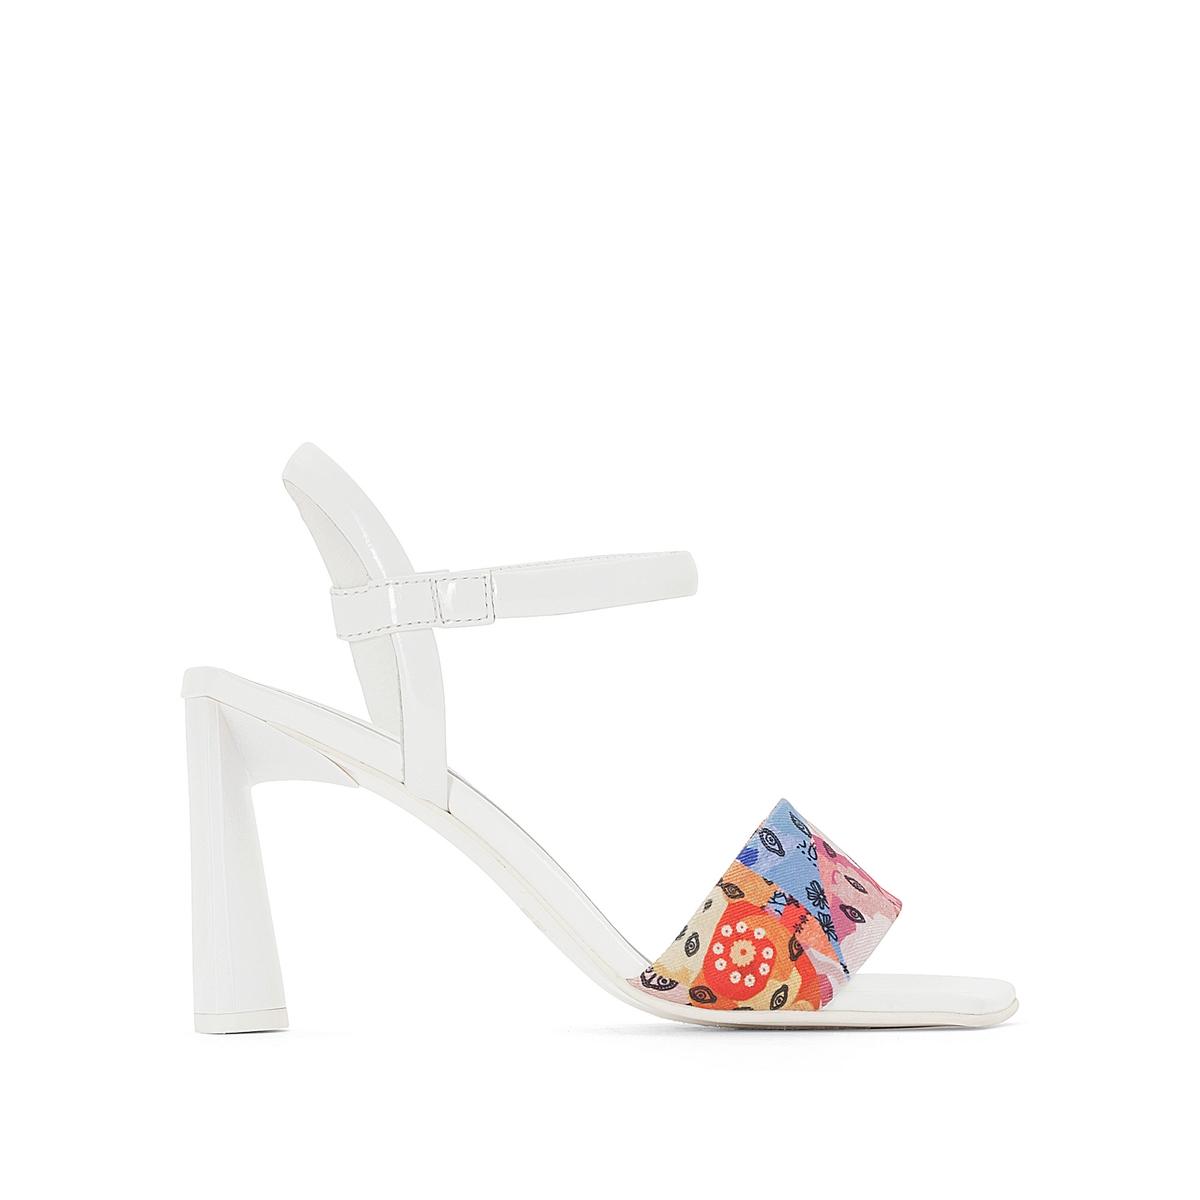 Босоножки из ткани от Amélie Pichard x La Redoute